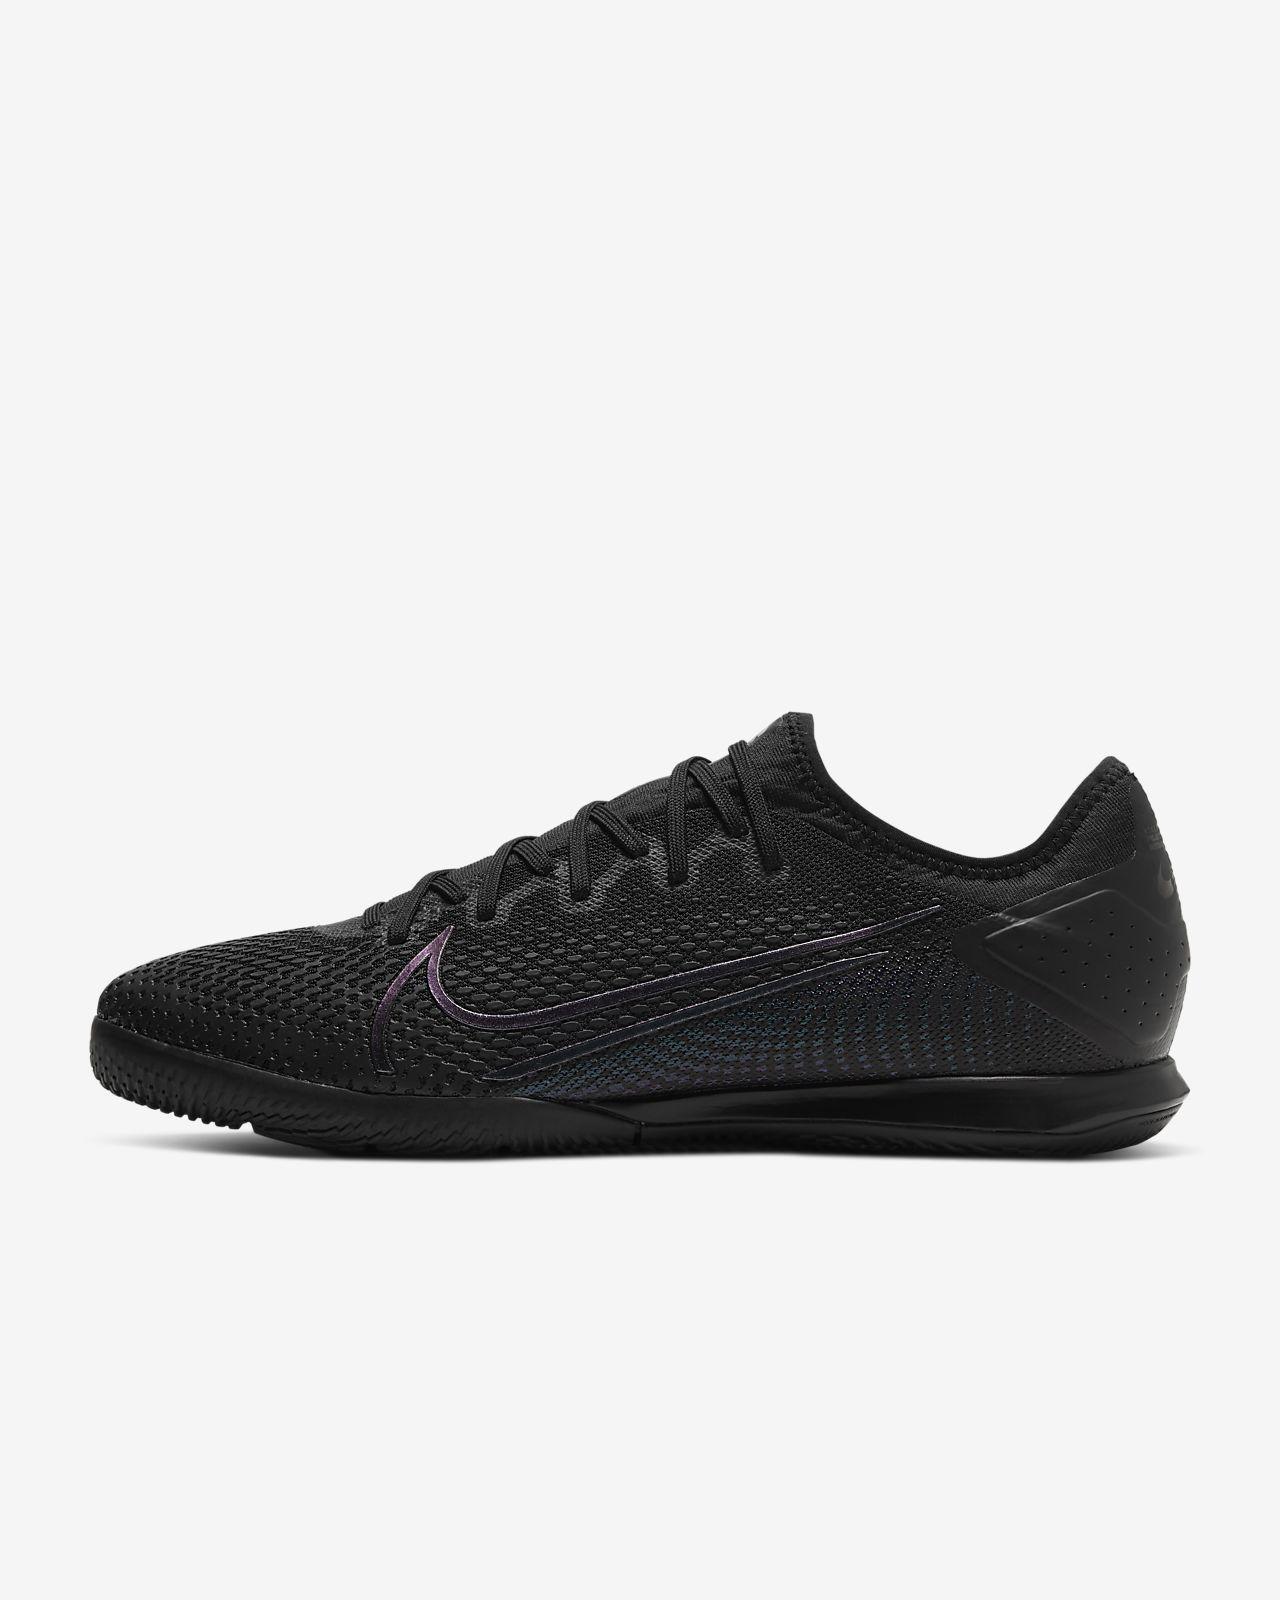 Halowe buty piłkarskie Nike Mercurial Vapor 13 Pro IC